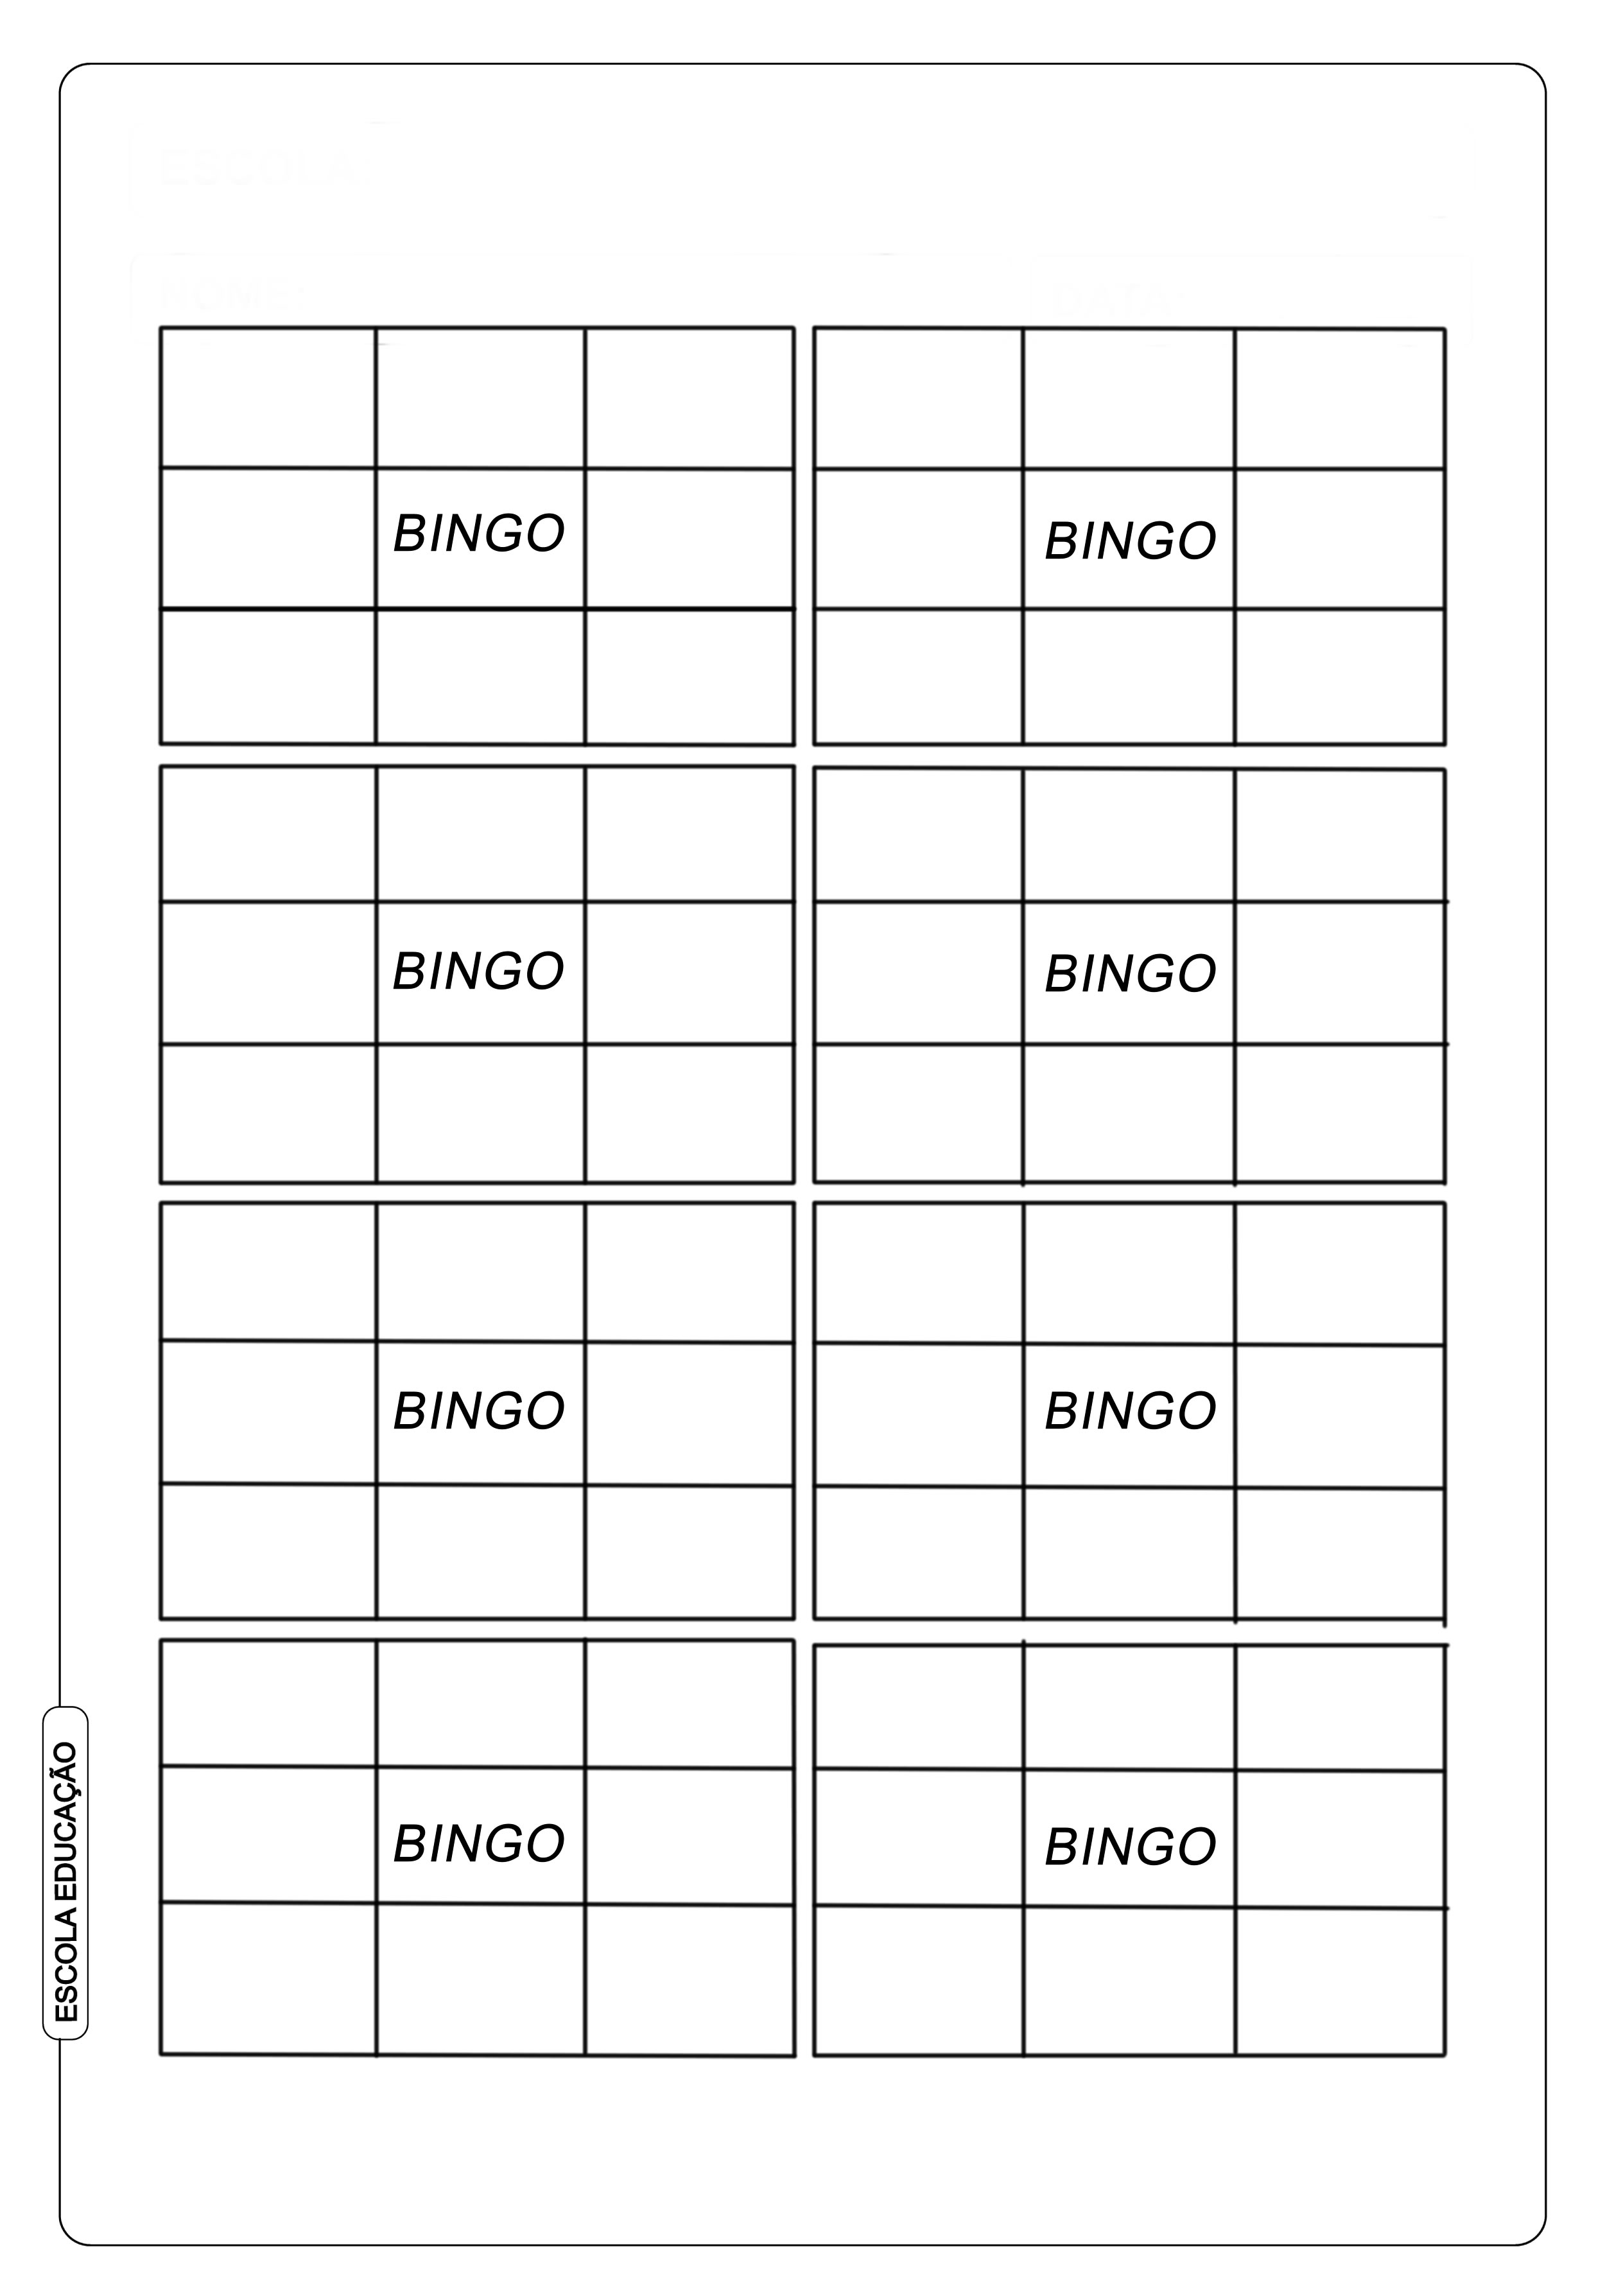 Cartela De Bingo De Palavras Para Alfabetizacao Escola Educacao